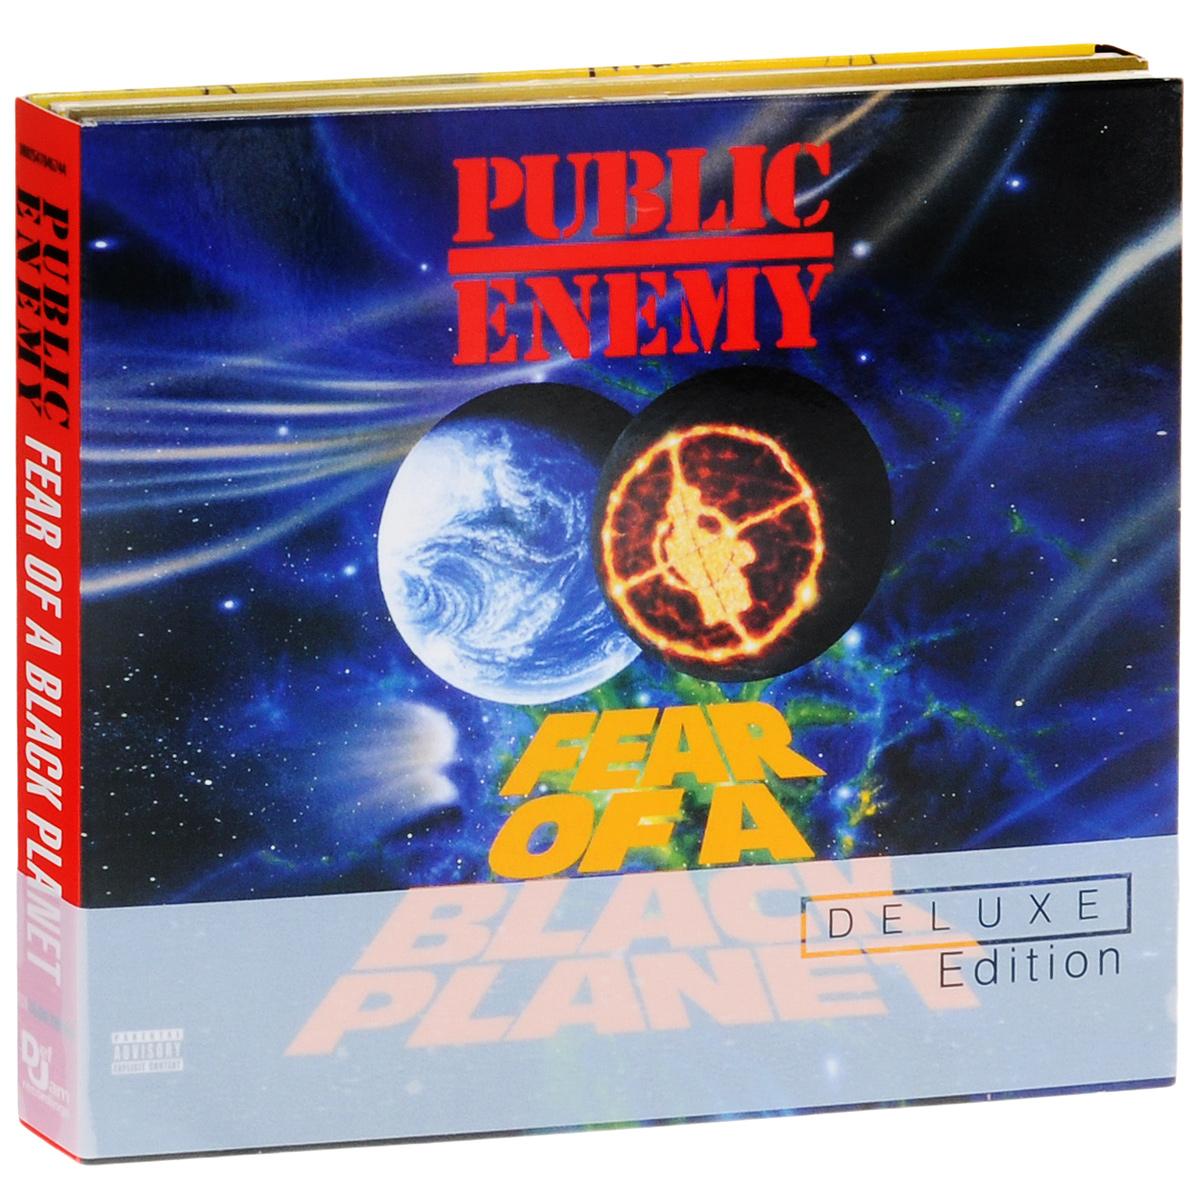 Public Enemy Public Enemy. Fear Of A Black Planet. Deluxe Edition (2 CD) public enemy public enemy live from metropolis studios limited edition 2 cd 2 lp blu ray